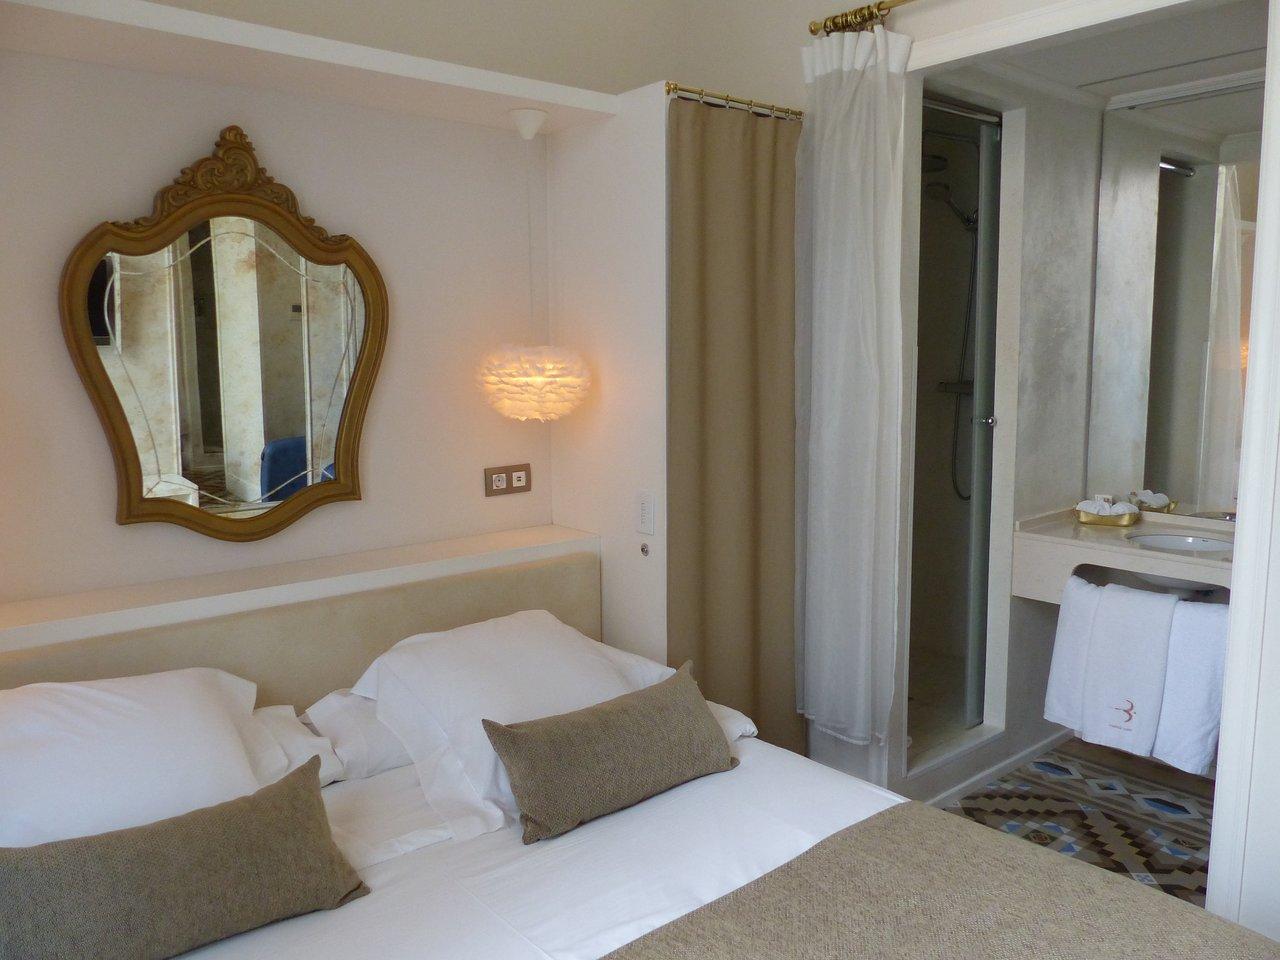 anakena house updated 2019 prices inn reviews barcelona rh tripadvisor com